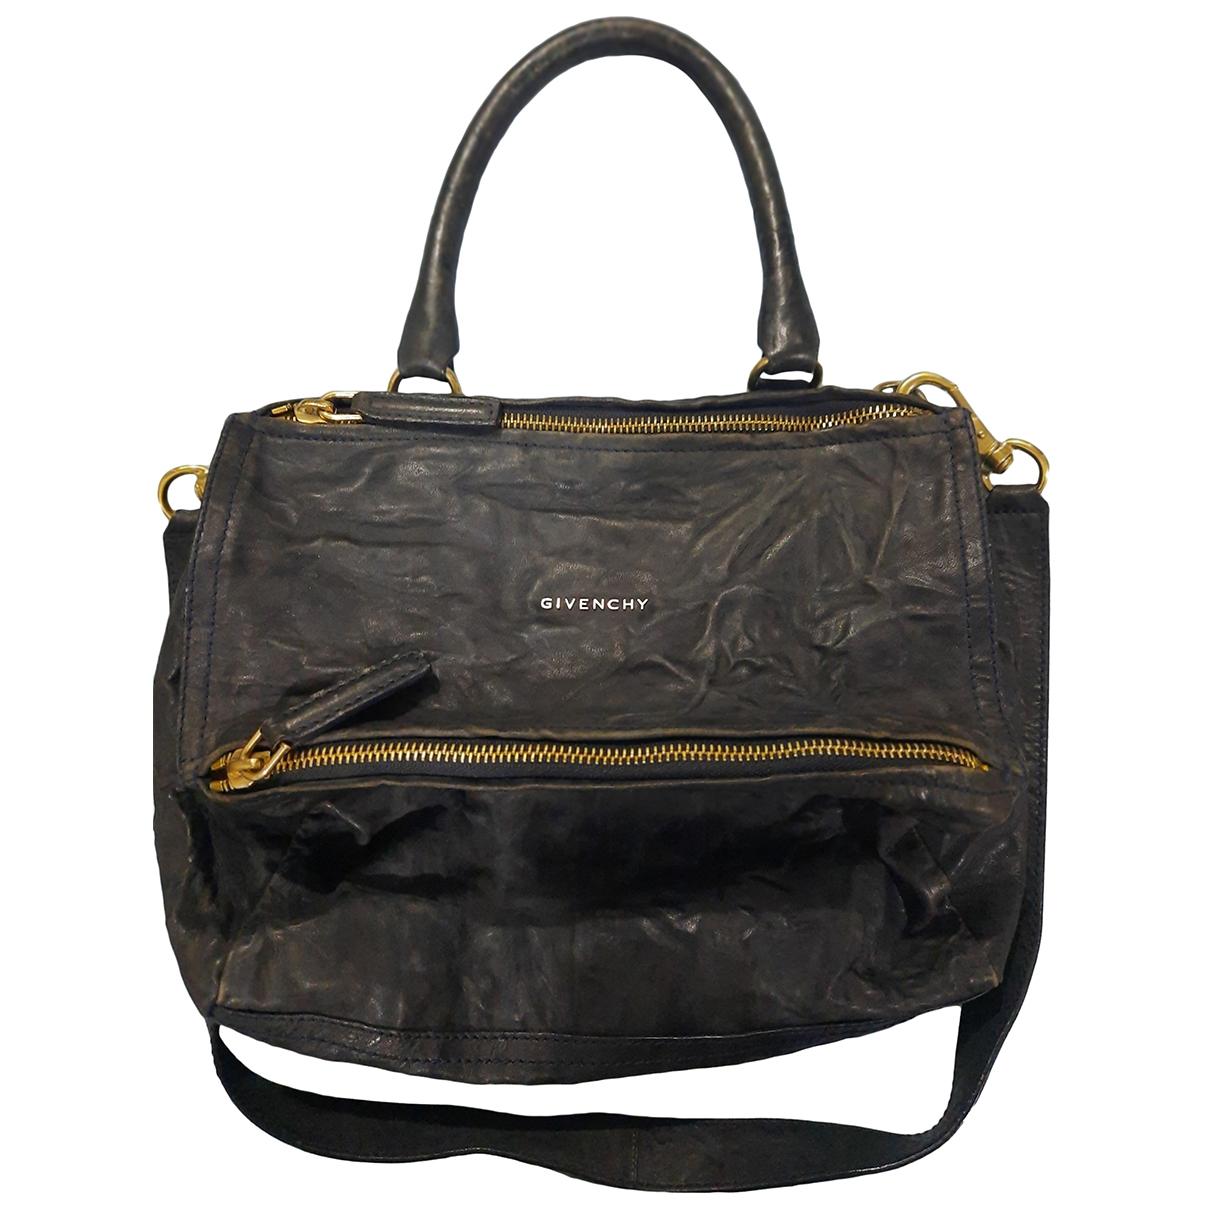 Givenchy - Sac a main Pandora pour femme en cuir